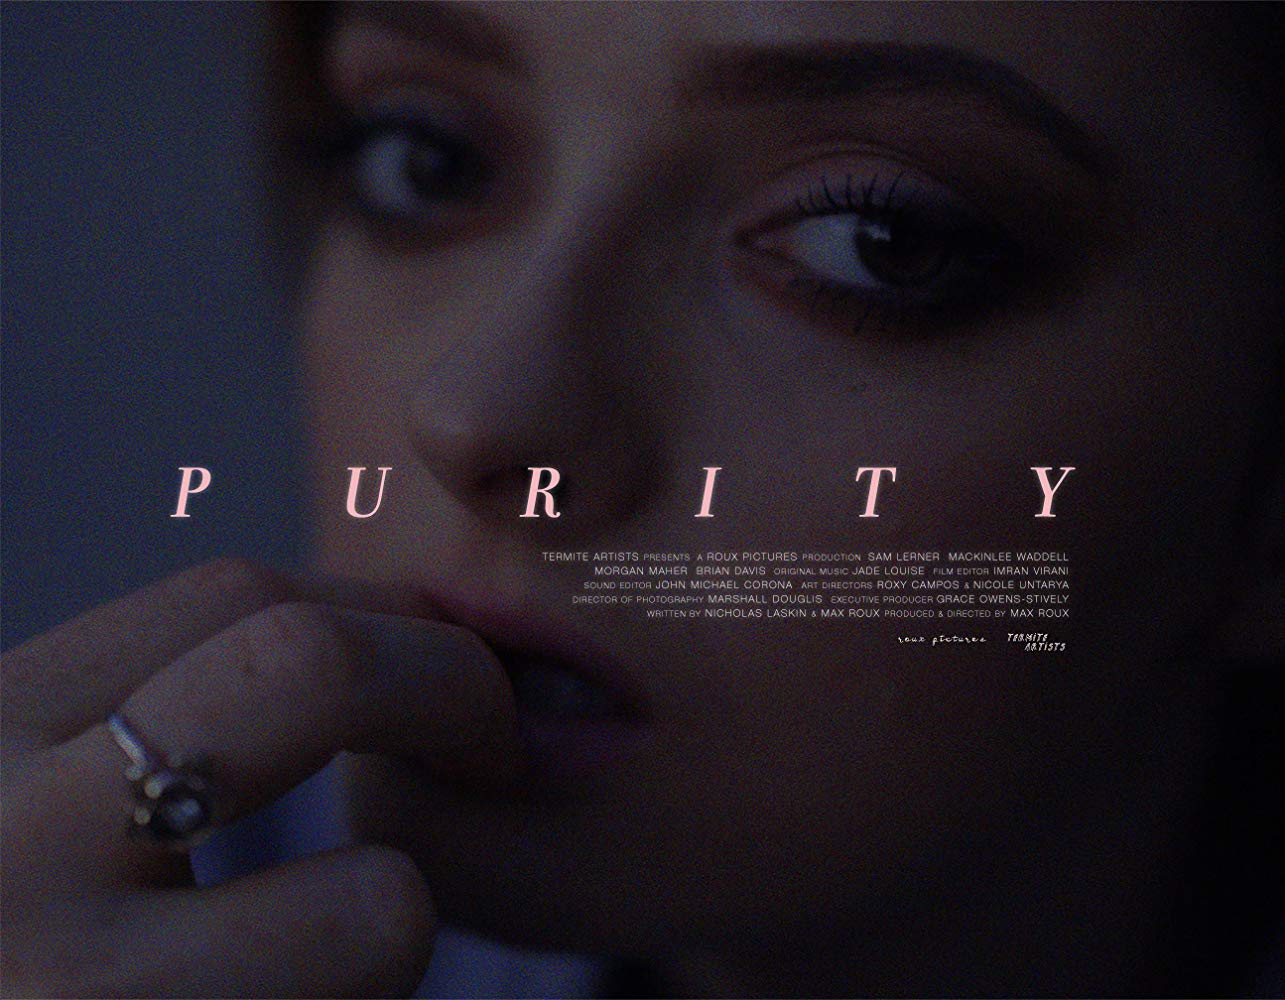 purity poster.jpg